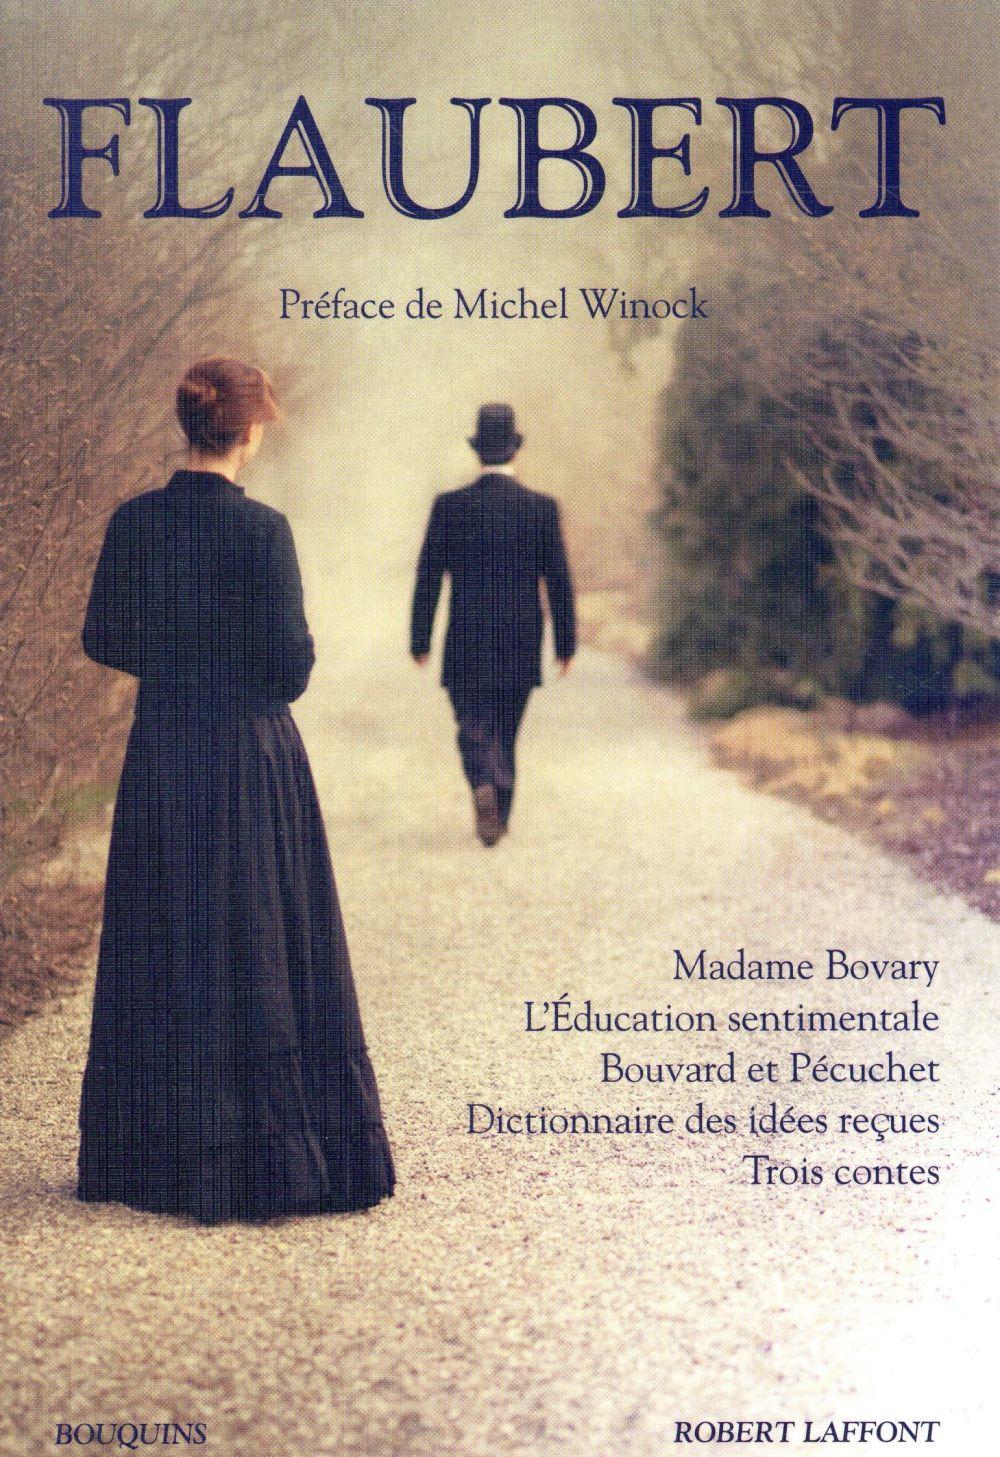 FLAUBERT - MADAME BOVARY, L-ED FLAUBERT/WINOCK BOUQUINS